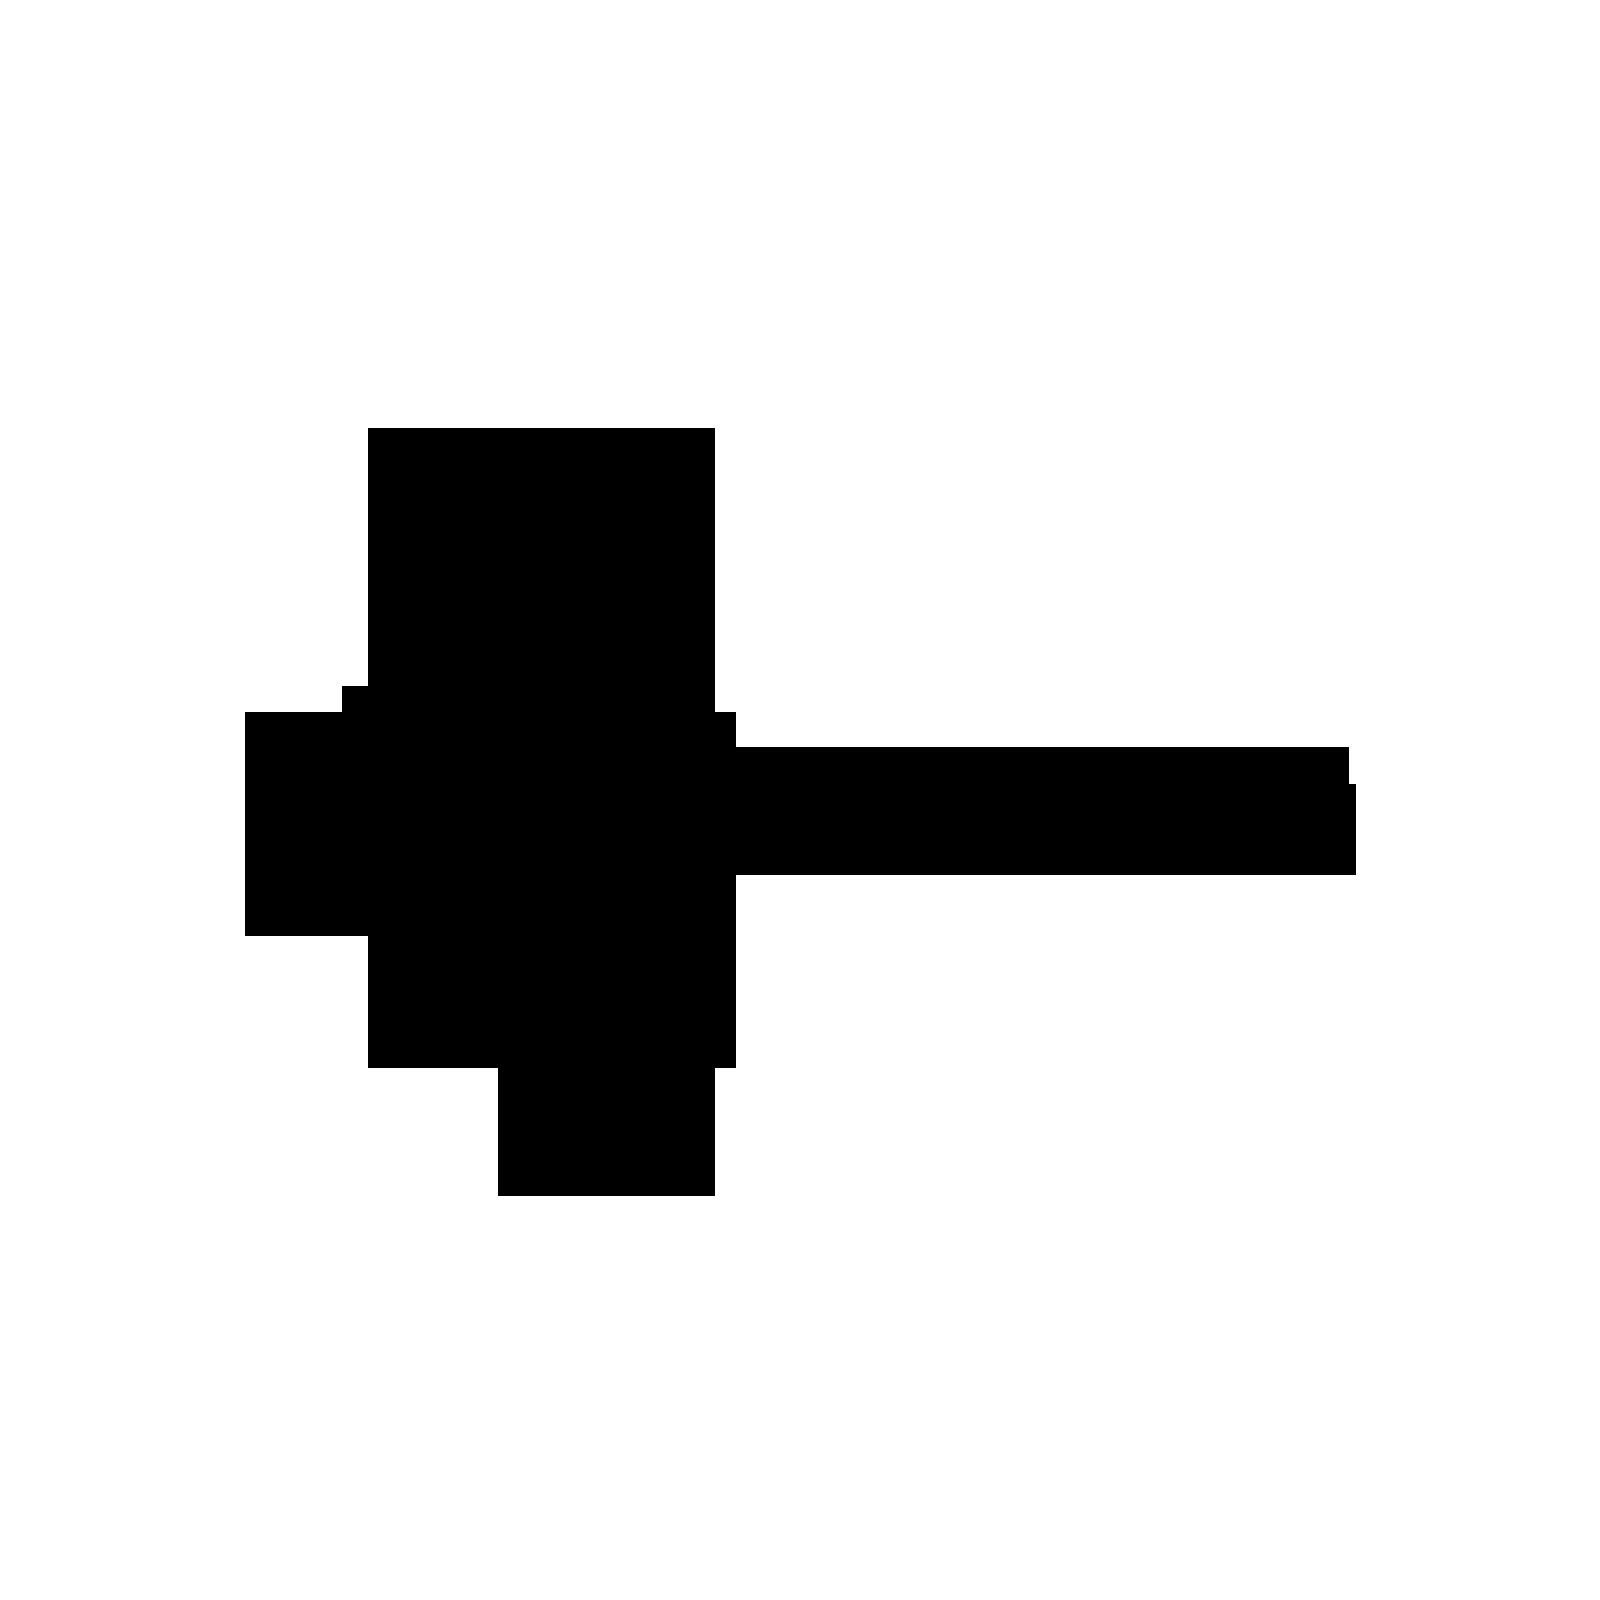 left_arrow